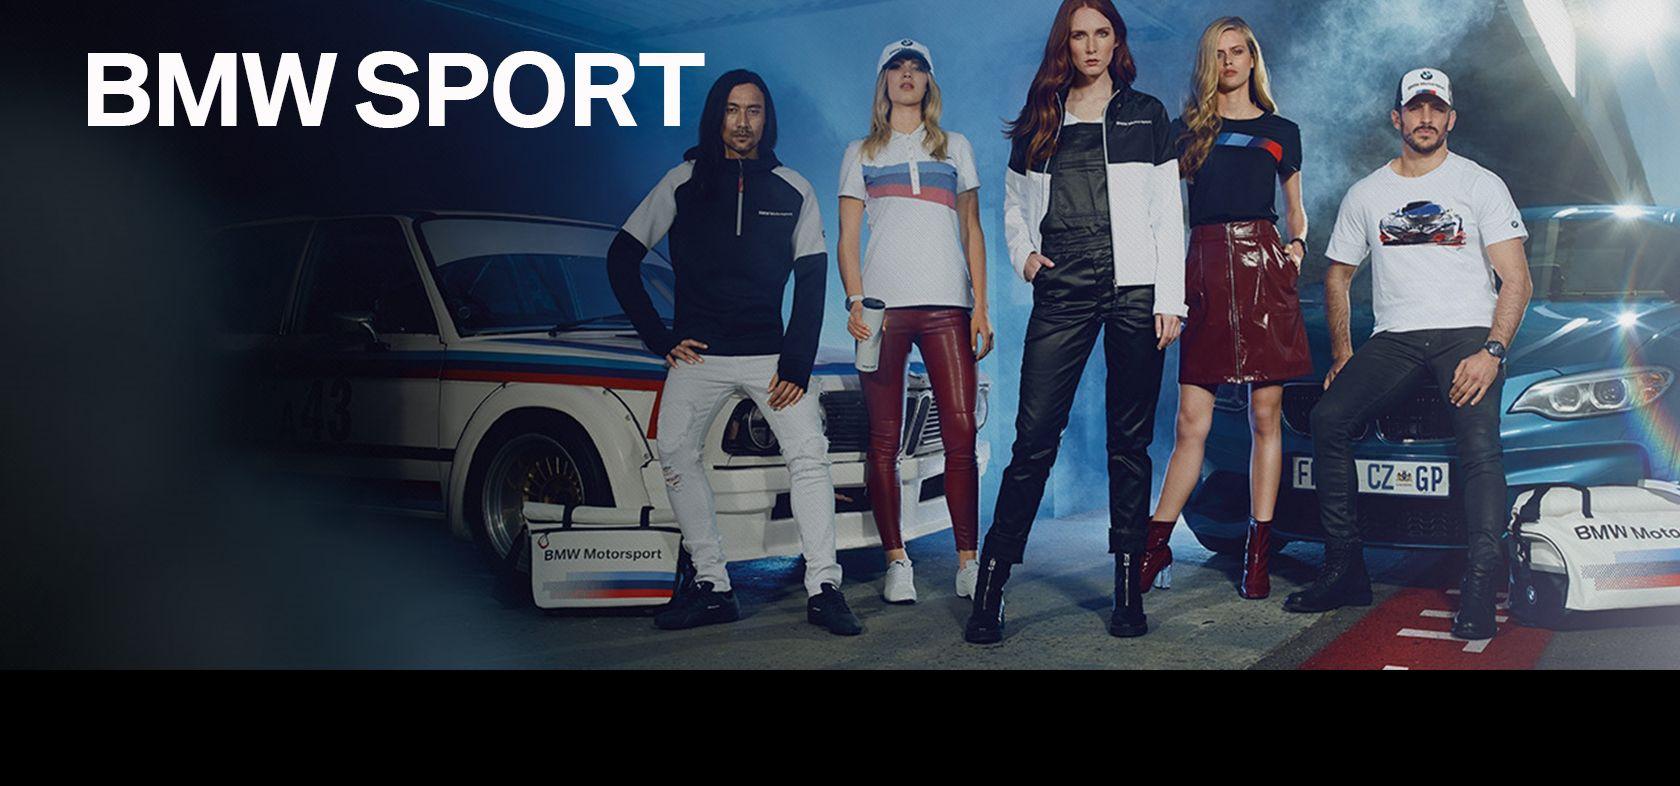 Productos BMW Sport